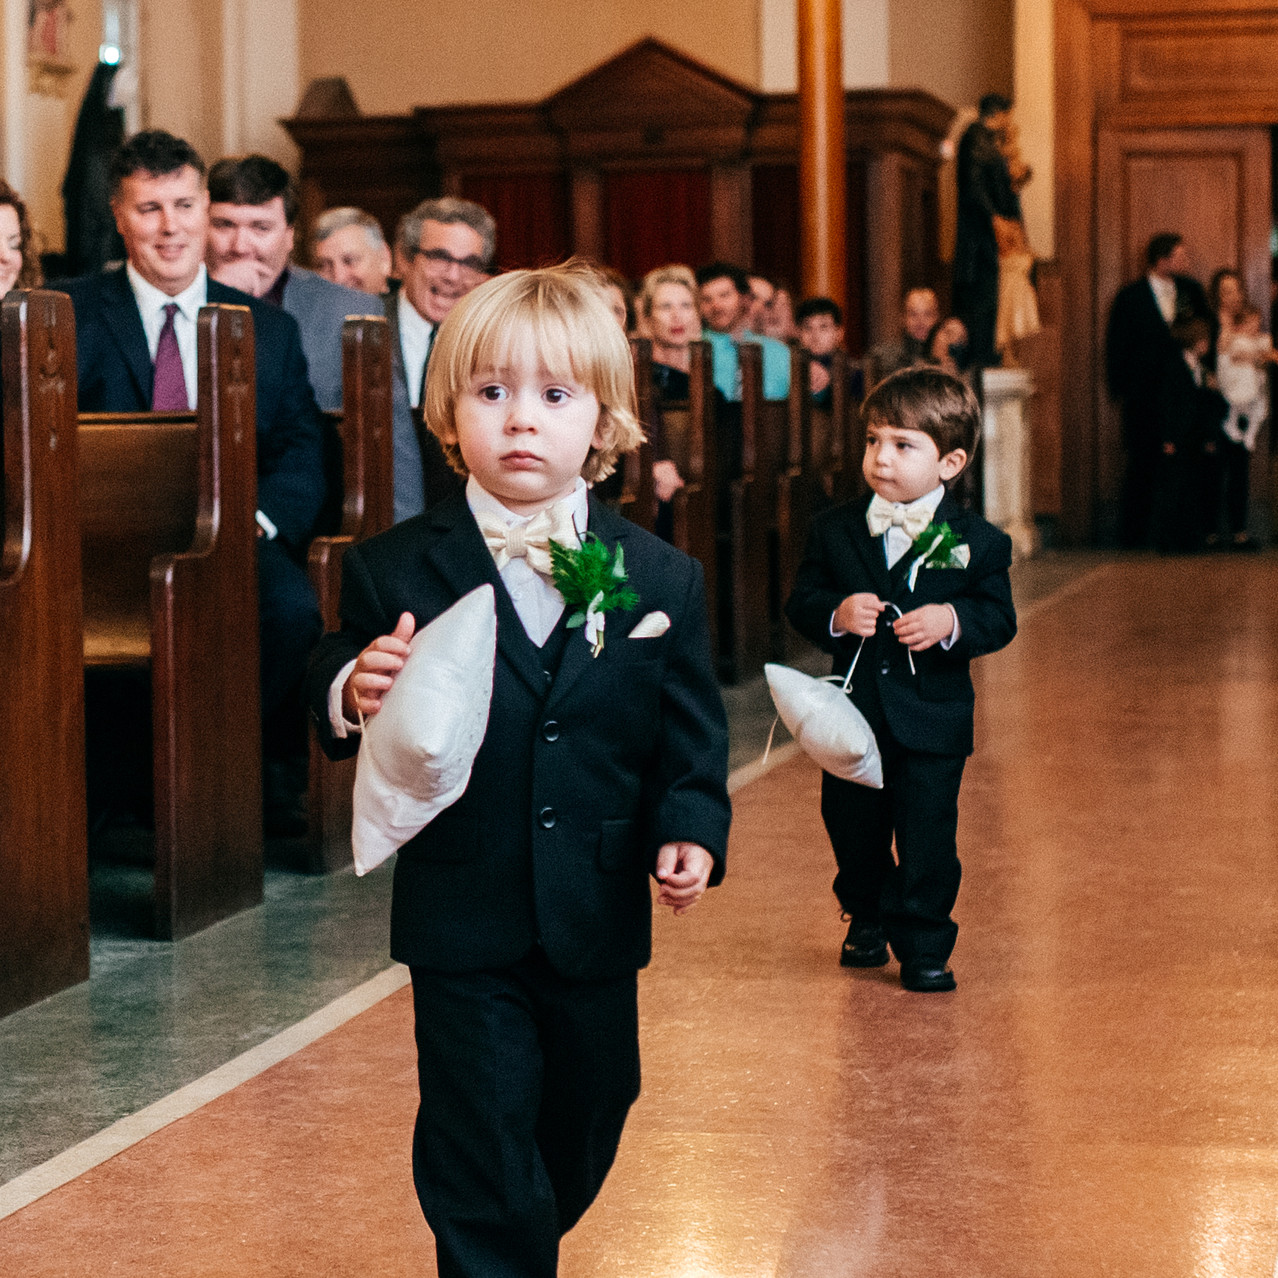 TaylorStewart-Wedding-Ceremony-48